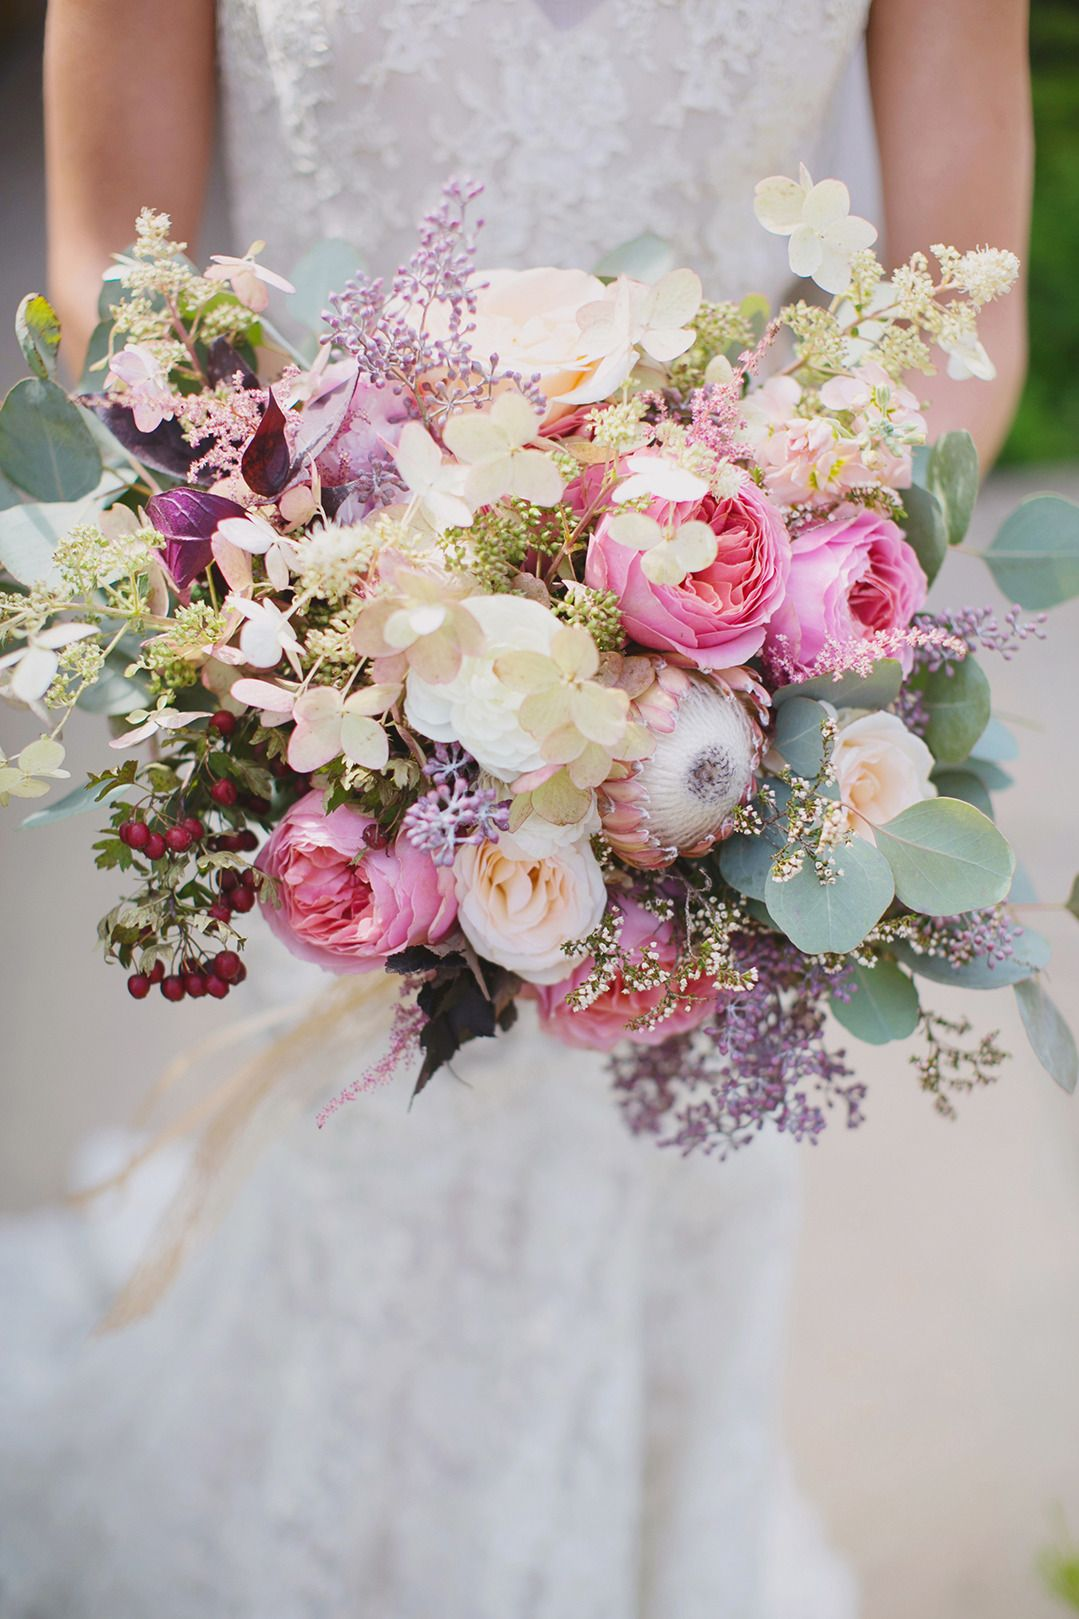 Majestic Fairytale Wedding Inspiration Floral Wedding Fairytale Wedding Inspiration Fairytale Wedding